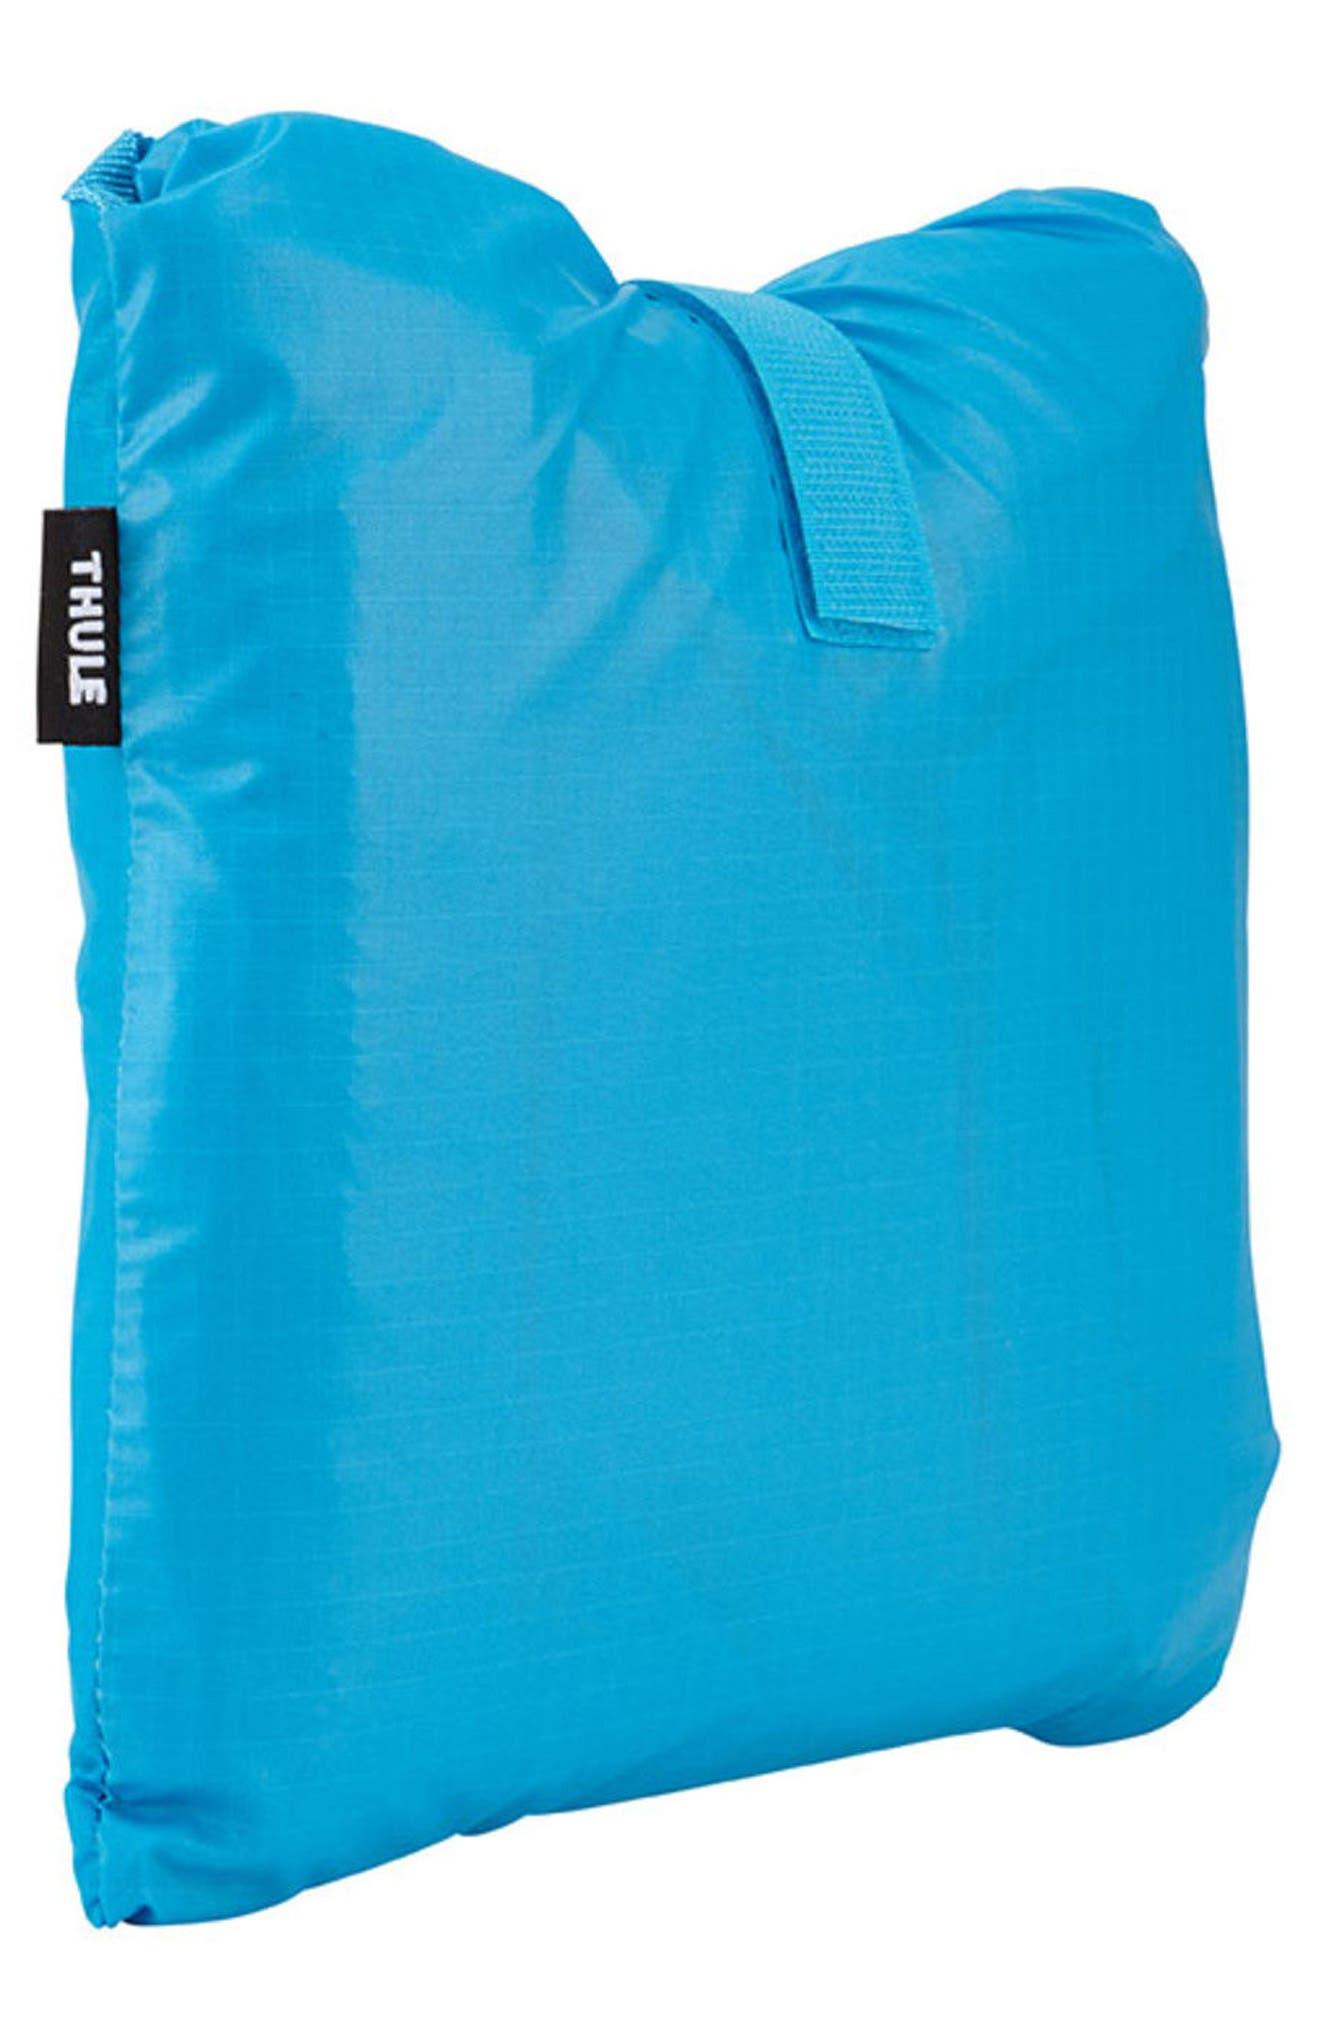 Sapling Child Carrier Rain Cover,                             Main thumbnail 1, color,                             THULE BLUE